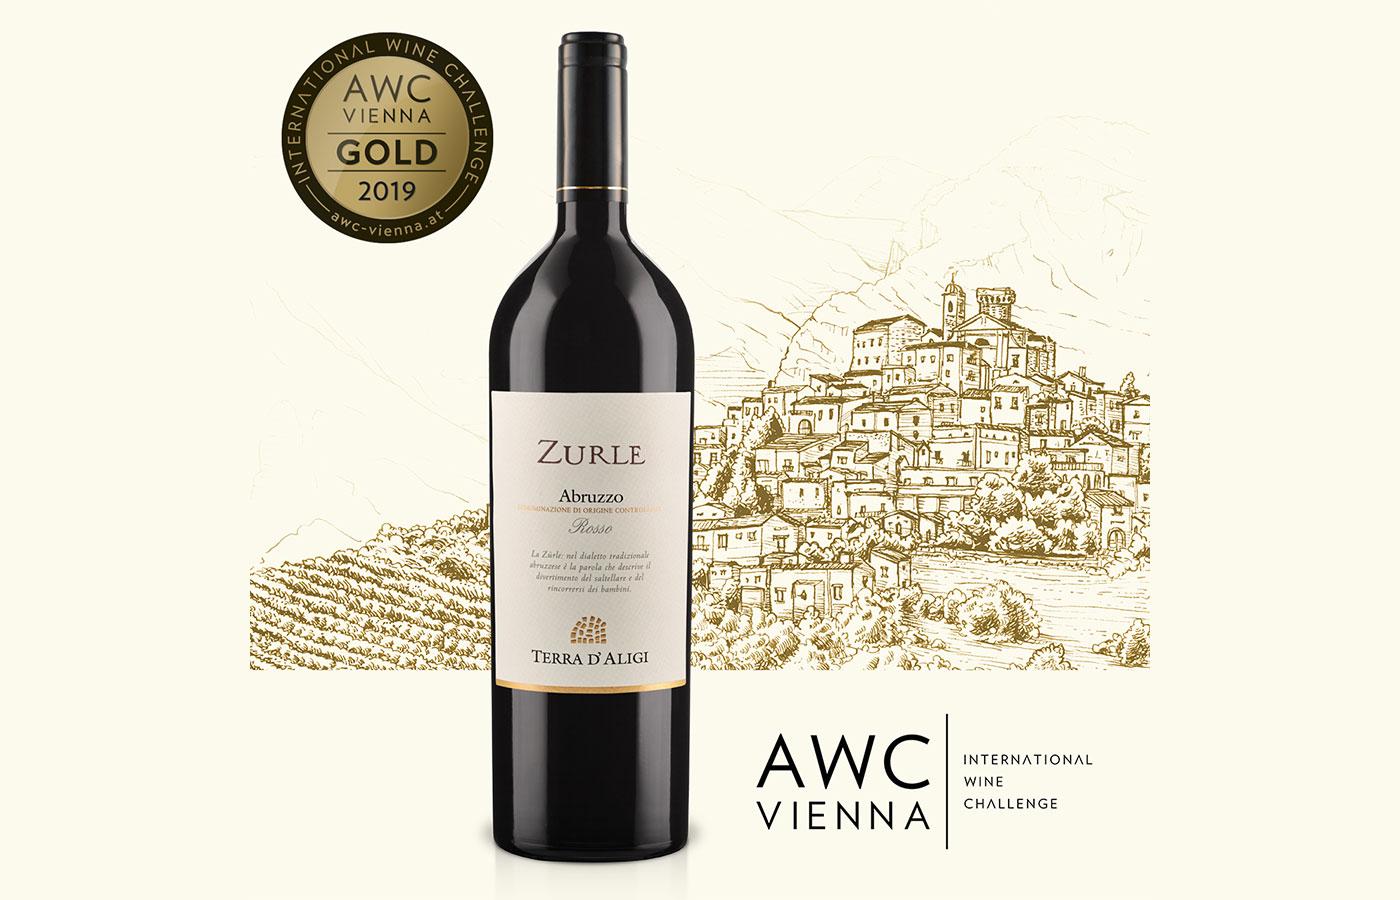 AWC Vienna 2019. Medaglia d'oro per ZURLE 2015 Terra d'Aligi!